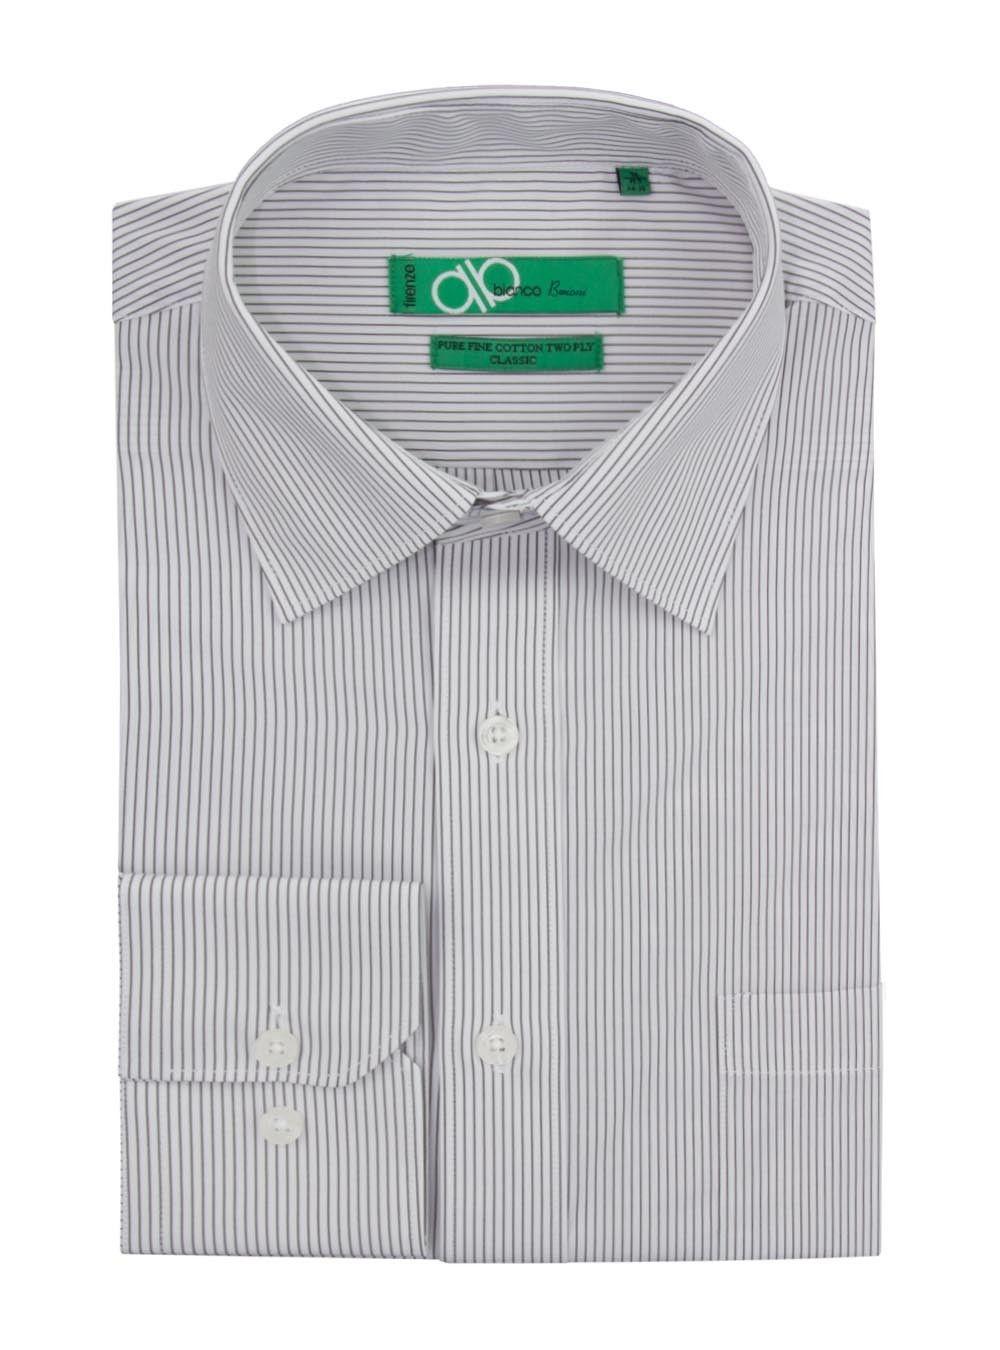 We Ensure High Quality Mens Dress Shirts Bianco B Mens Modern